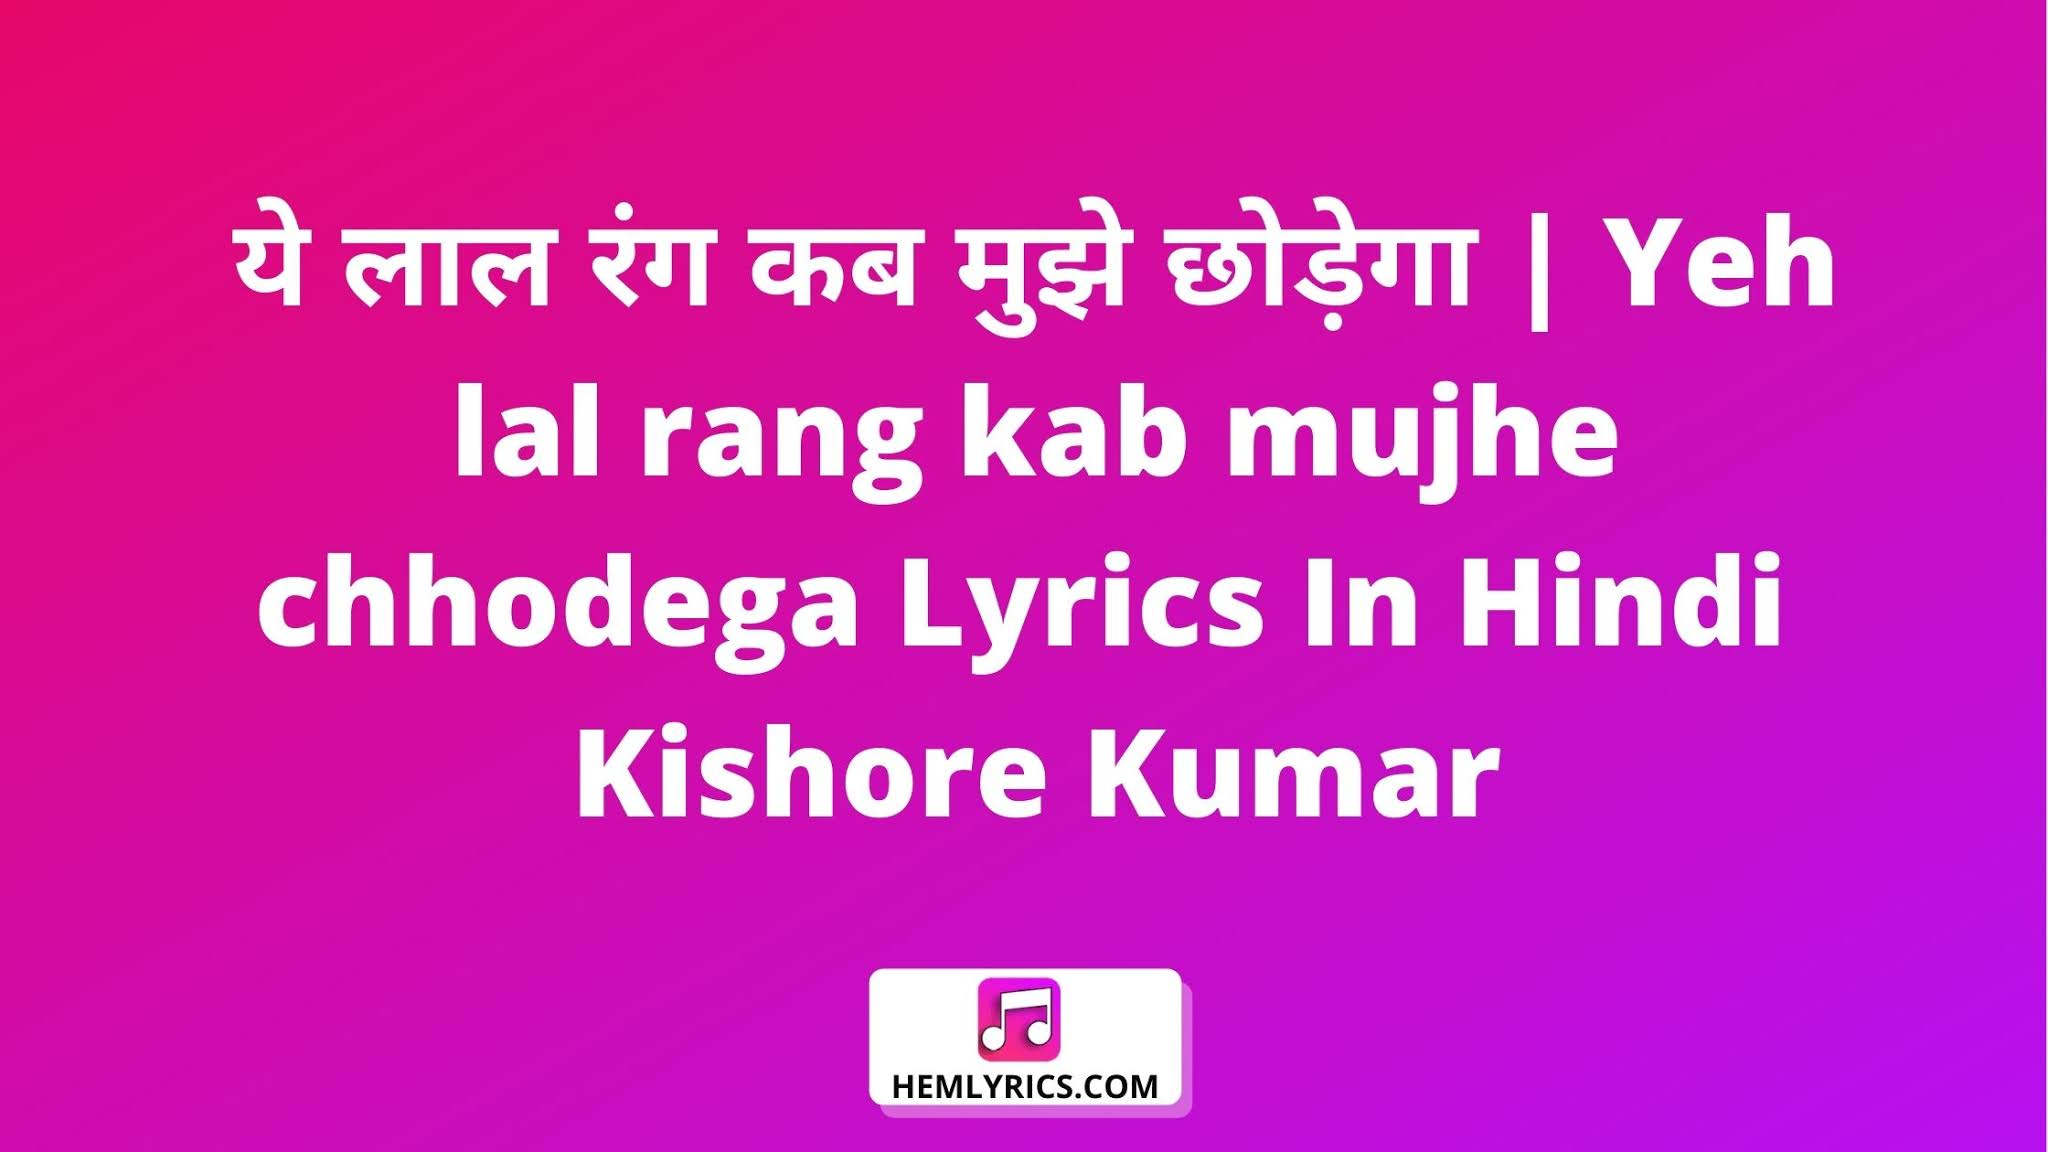 ये लाल रंग कब मुझे छोड़ेगा | Yeh lal rang kab mujhe chhodega Lyrics In Hindi And English - Kishore Kumar